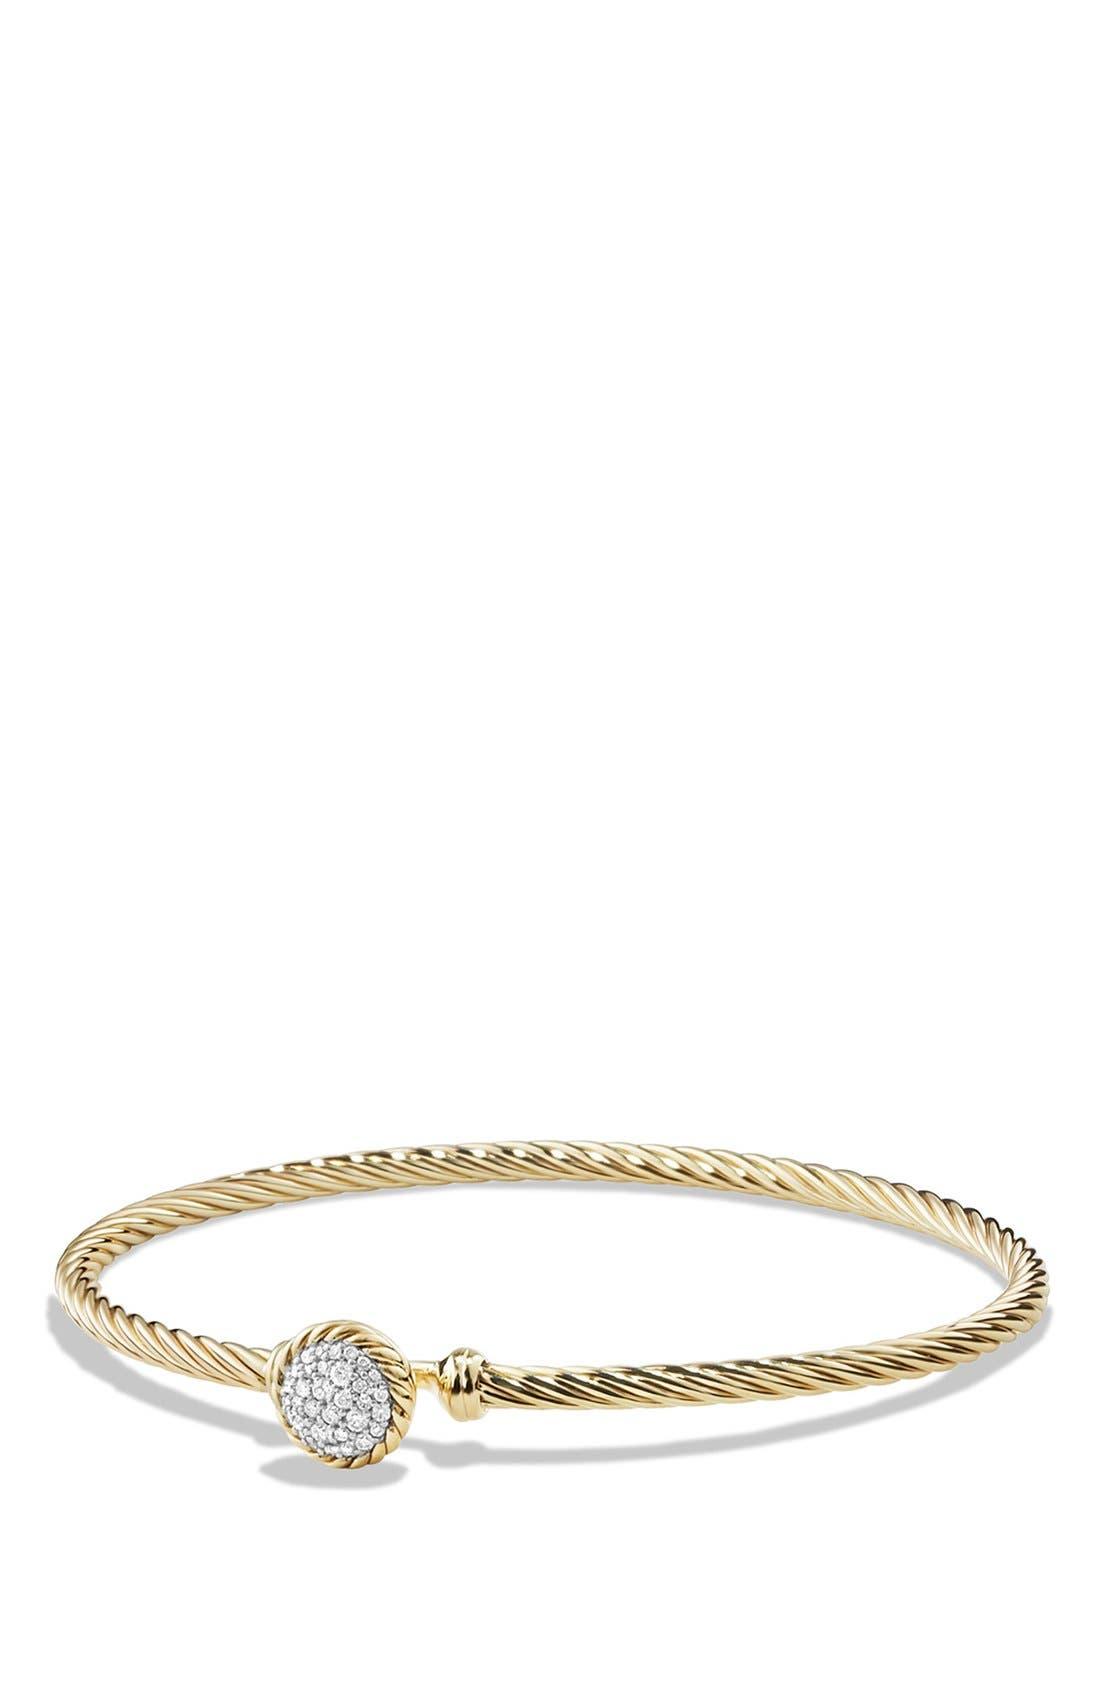 Alternate Image 1 Selected - David Yurman 'Châtelaine' Bracelet with Diamonds in 18K Gold